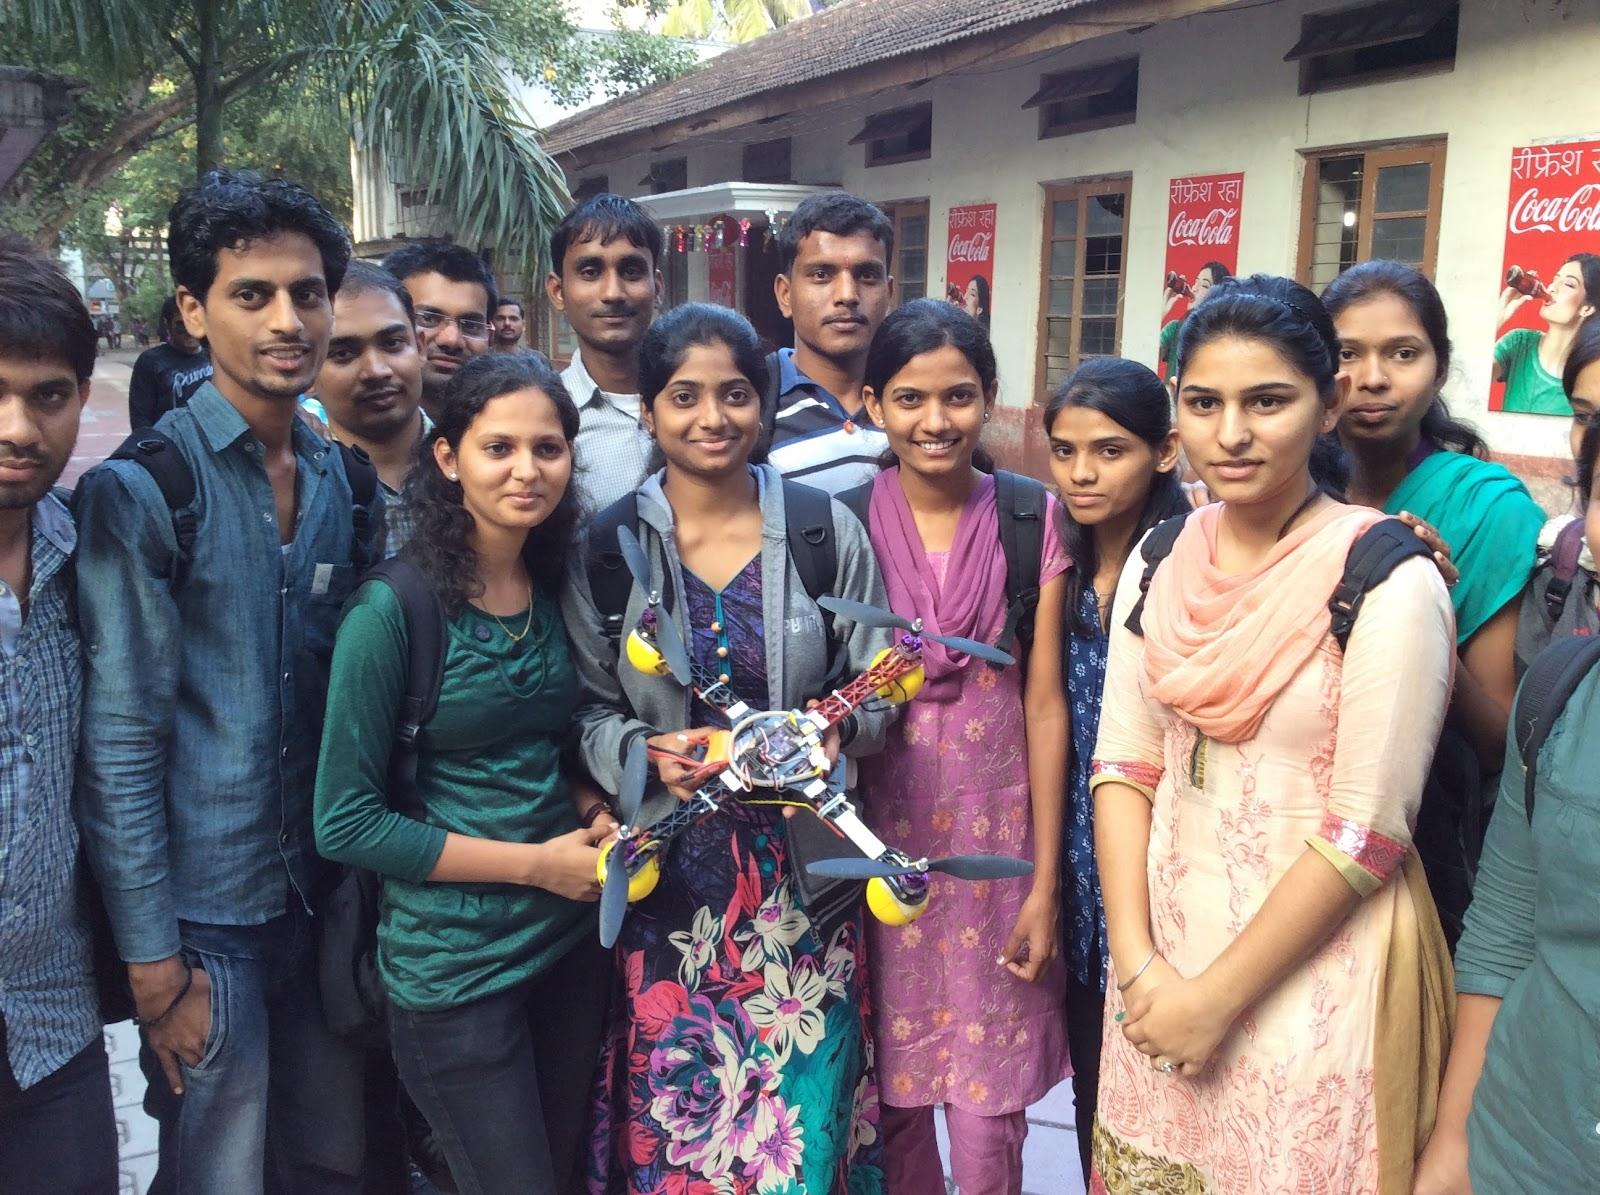 Nowrosejee Wadia College, Pune Robolab (11).jpg